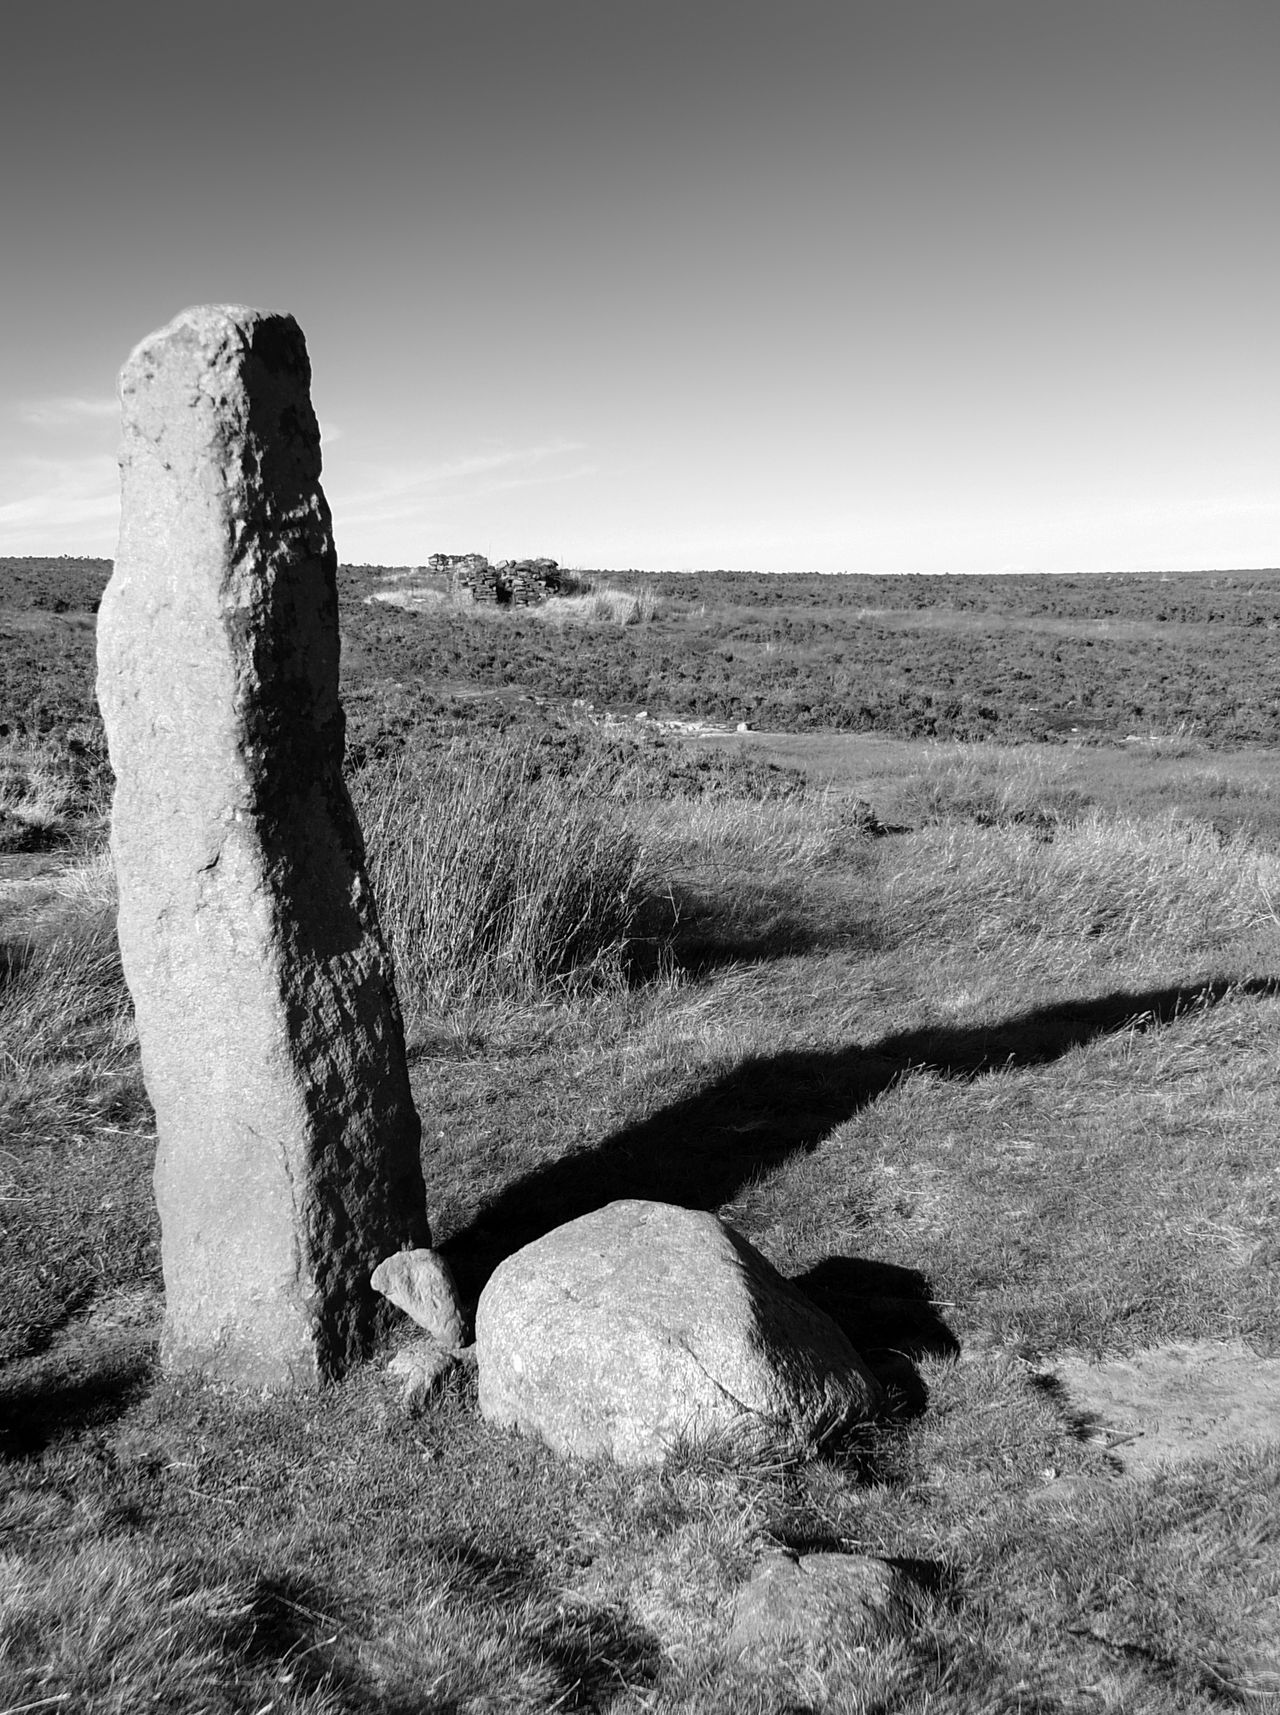 churn milk joan Monolith Outdoors Shadow Standing Stone Standing Stones